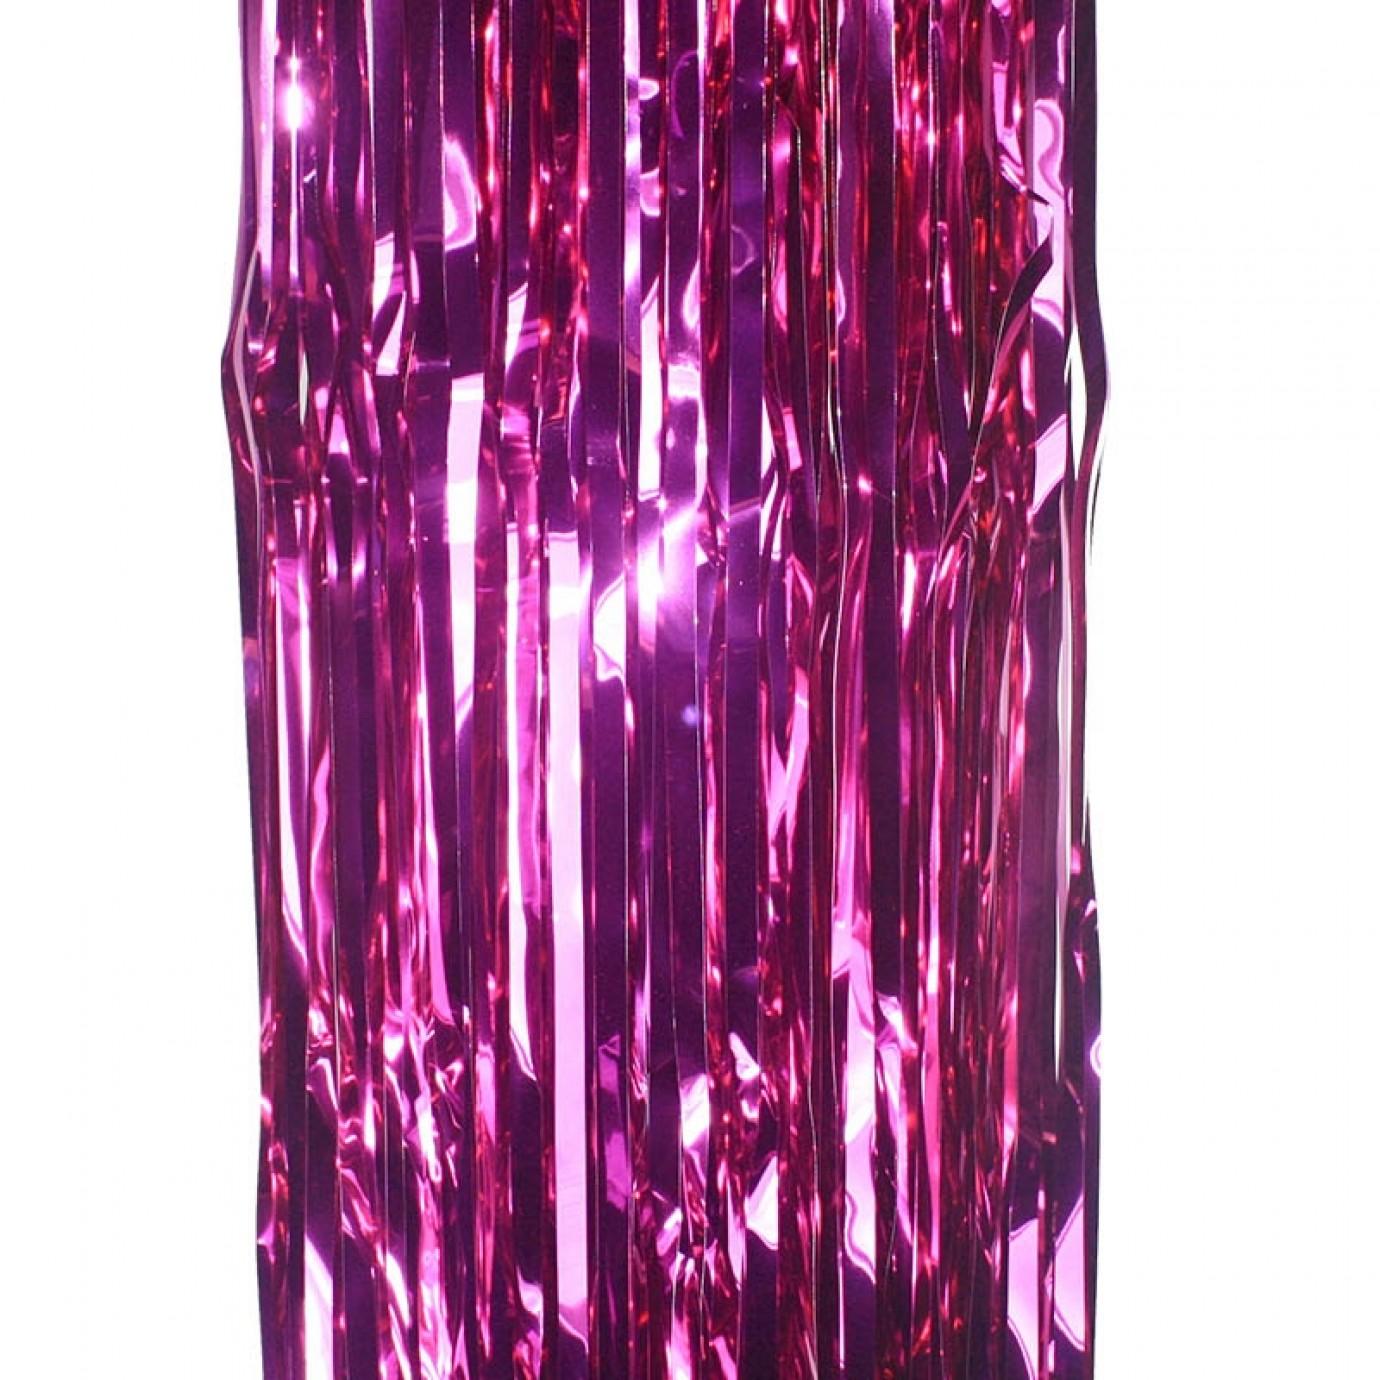 Door Curtain Foil Hot Pink Curtains Hanging Decorations